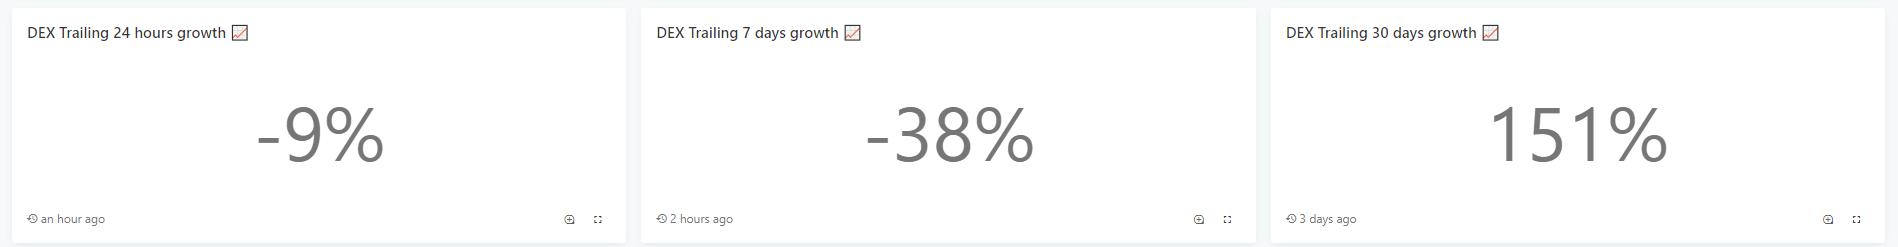 Комиссии в сети Ethereum упали до минимума с начала августа